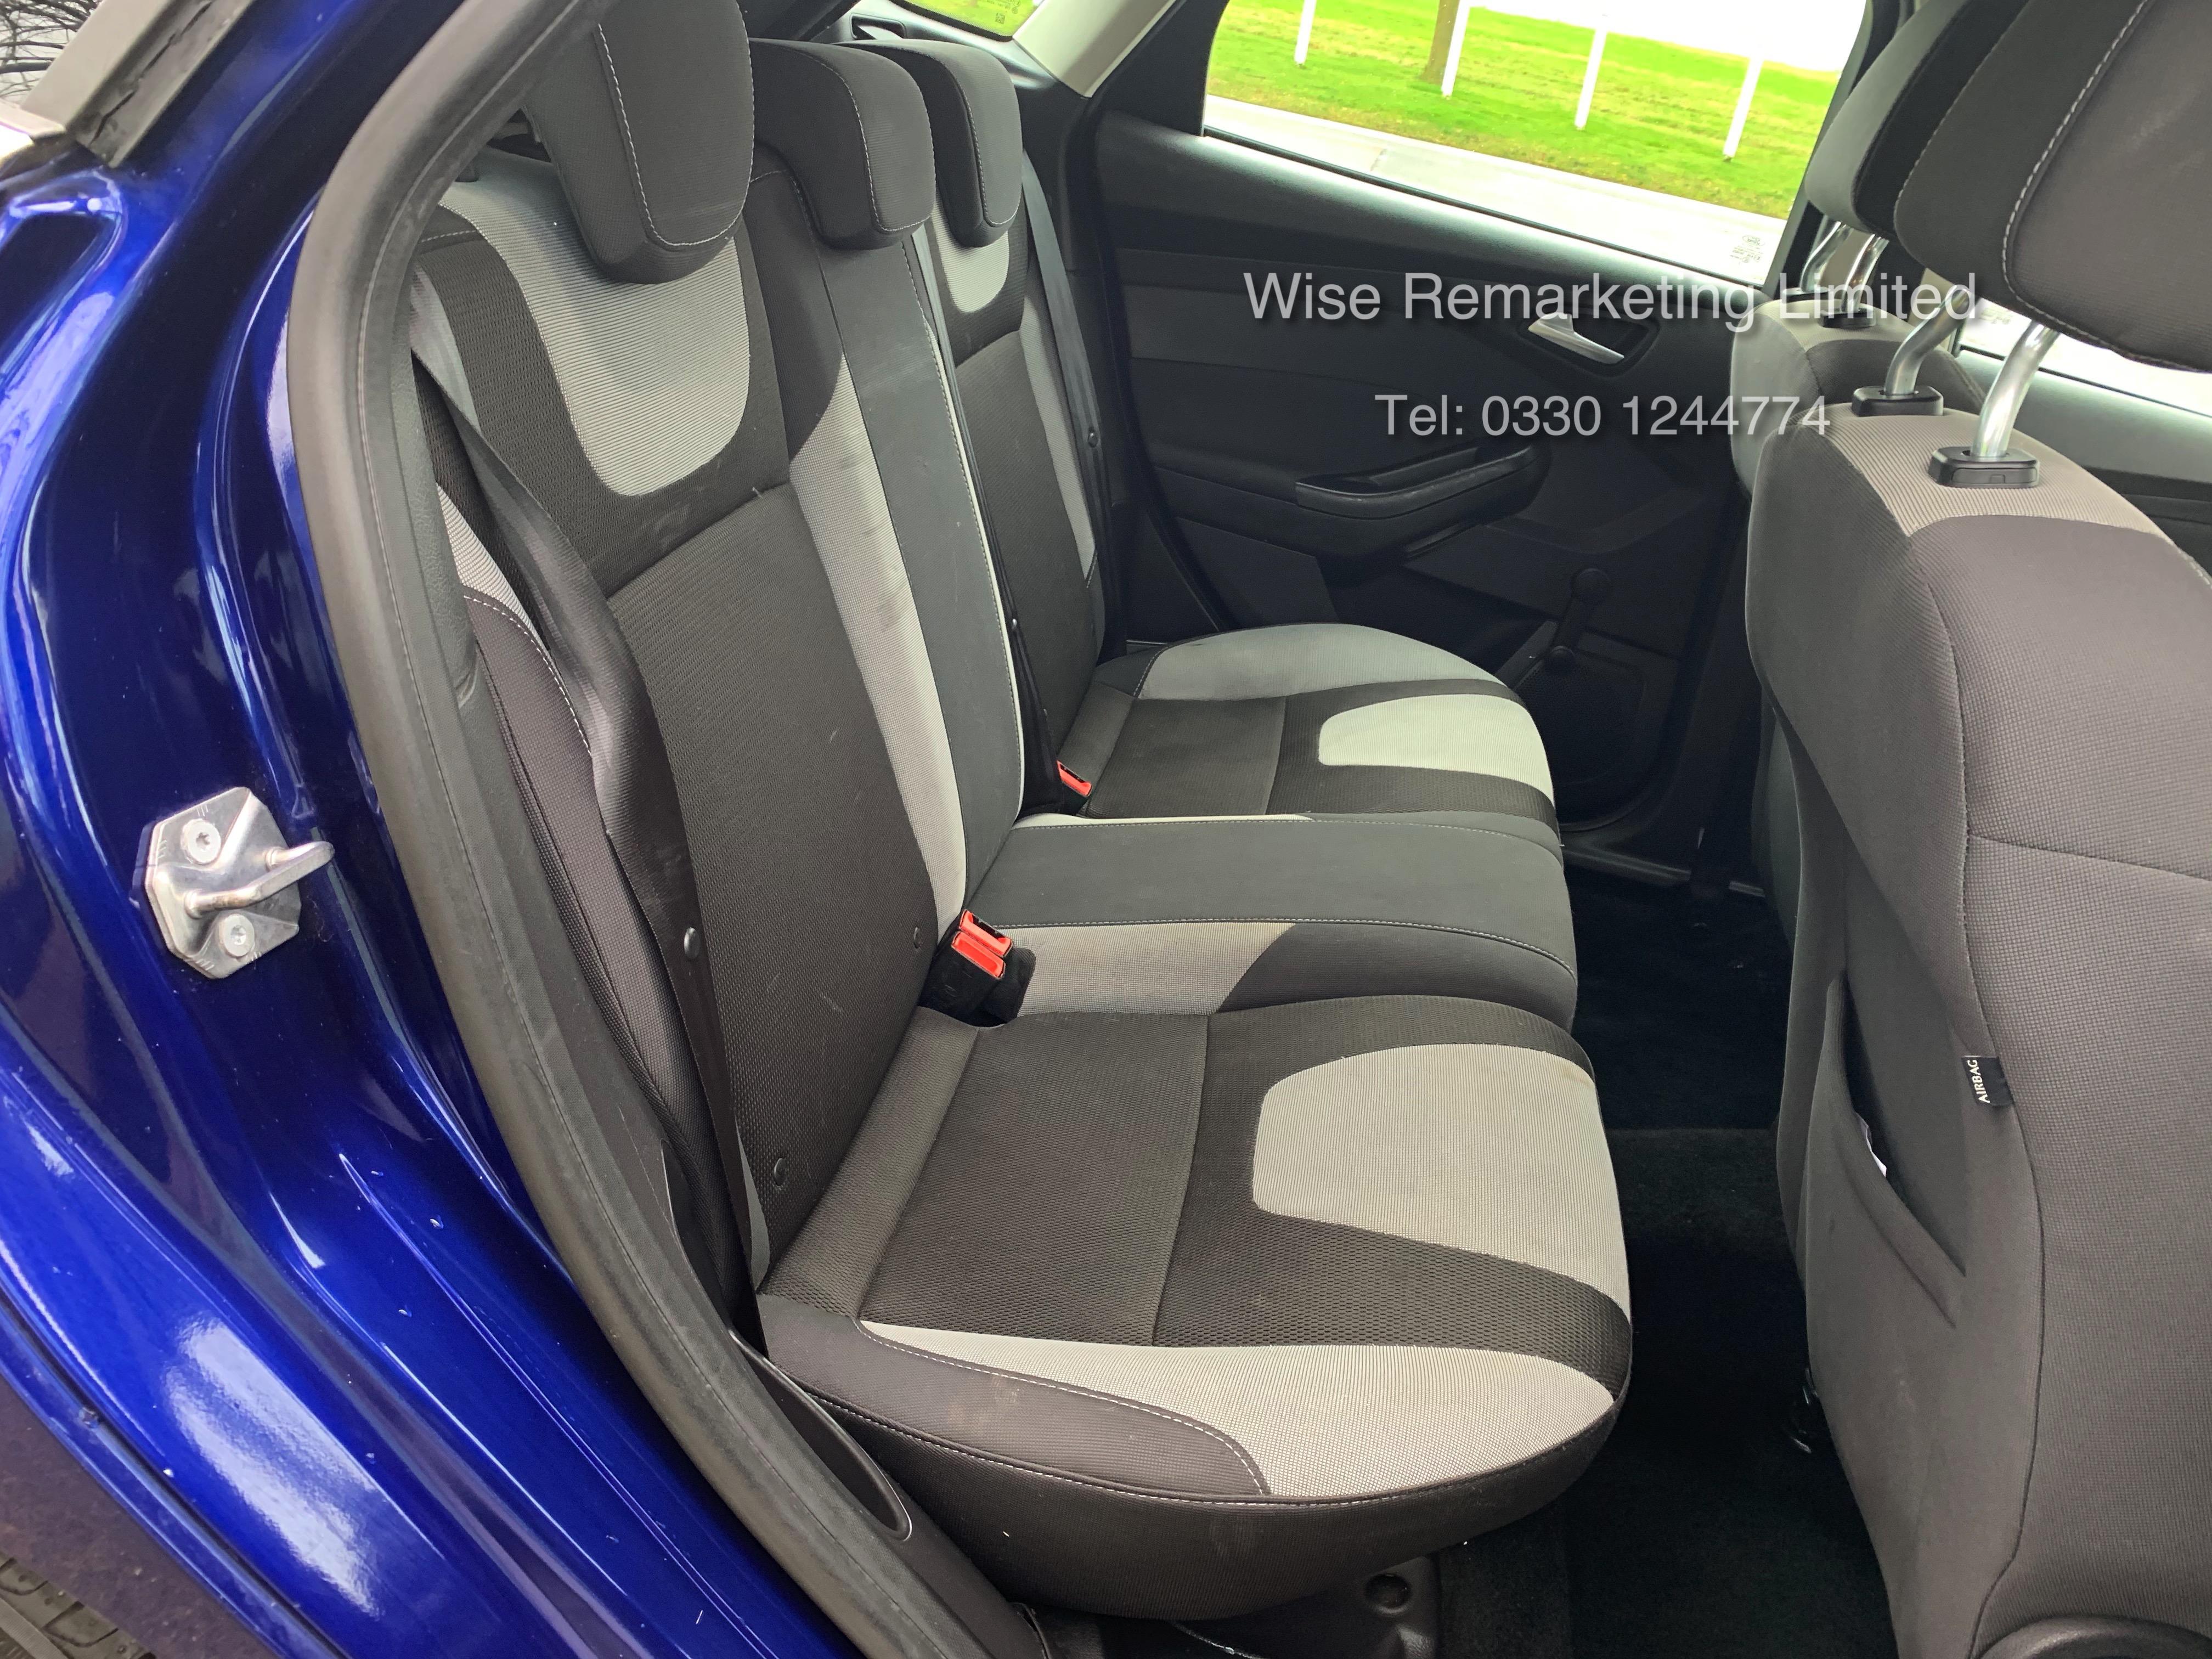 Ford Focus Zetec 1.6 TDCI Econetic - 2015 Model - 6 Speed - - Image 14 of 20